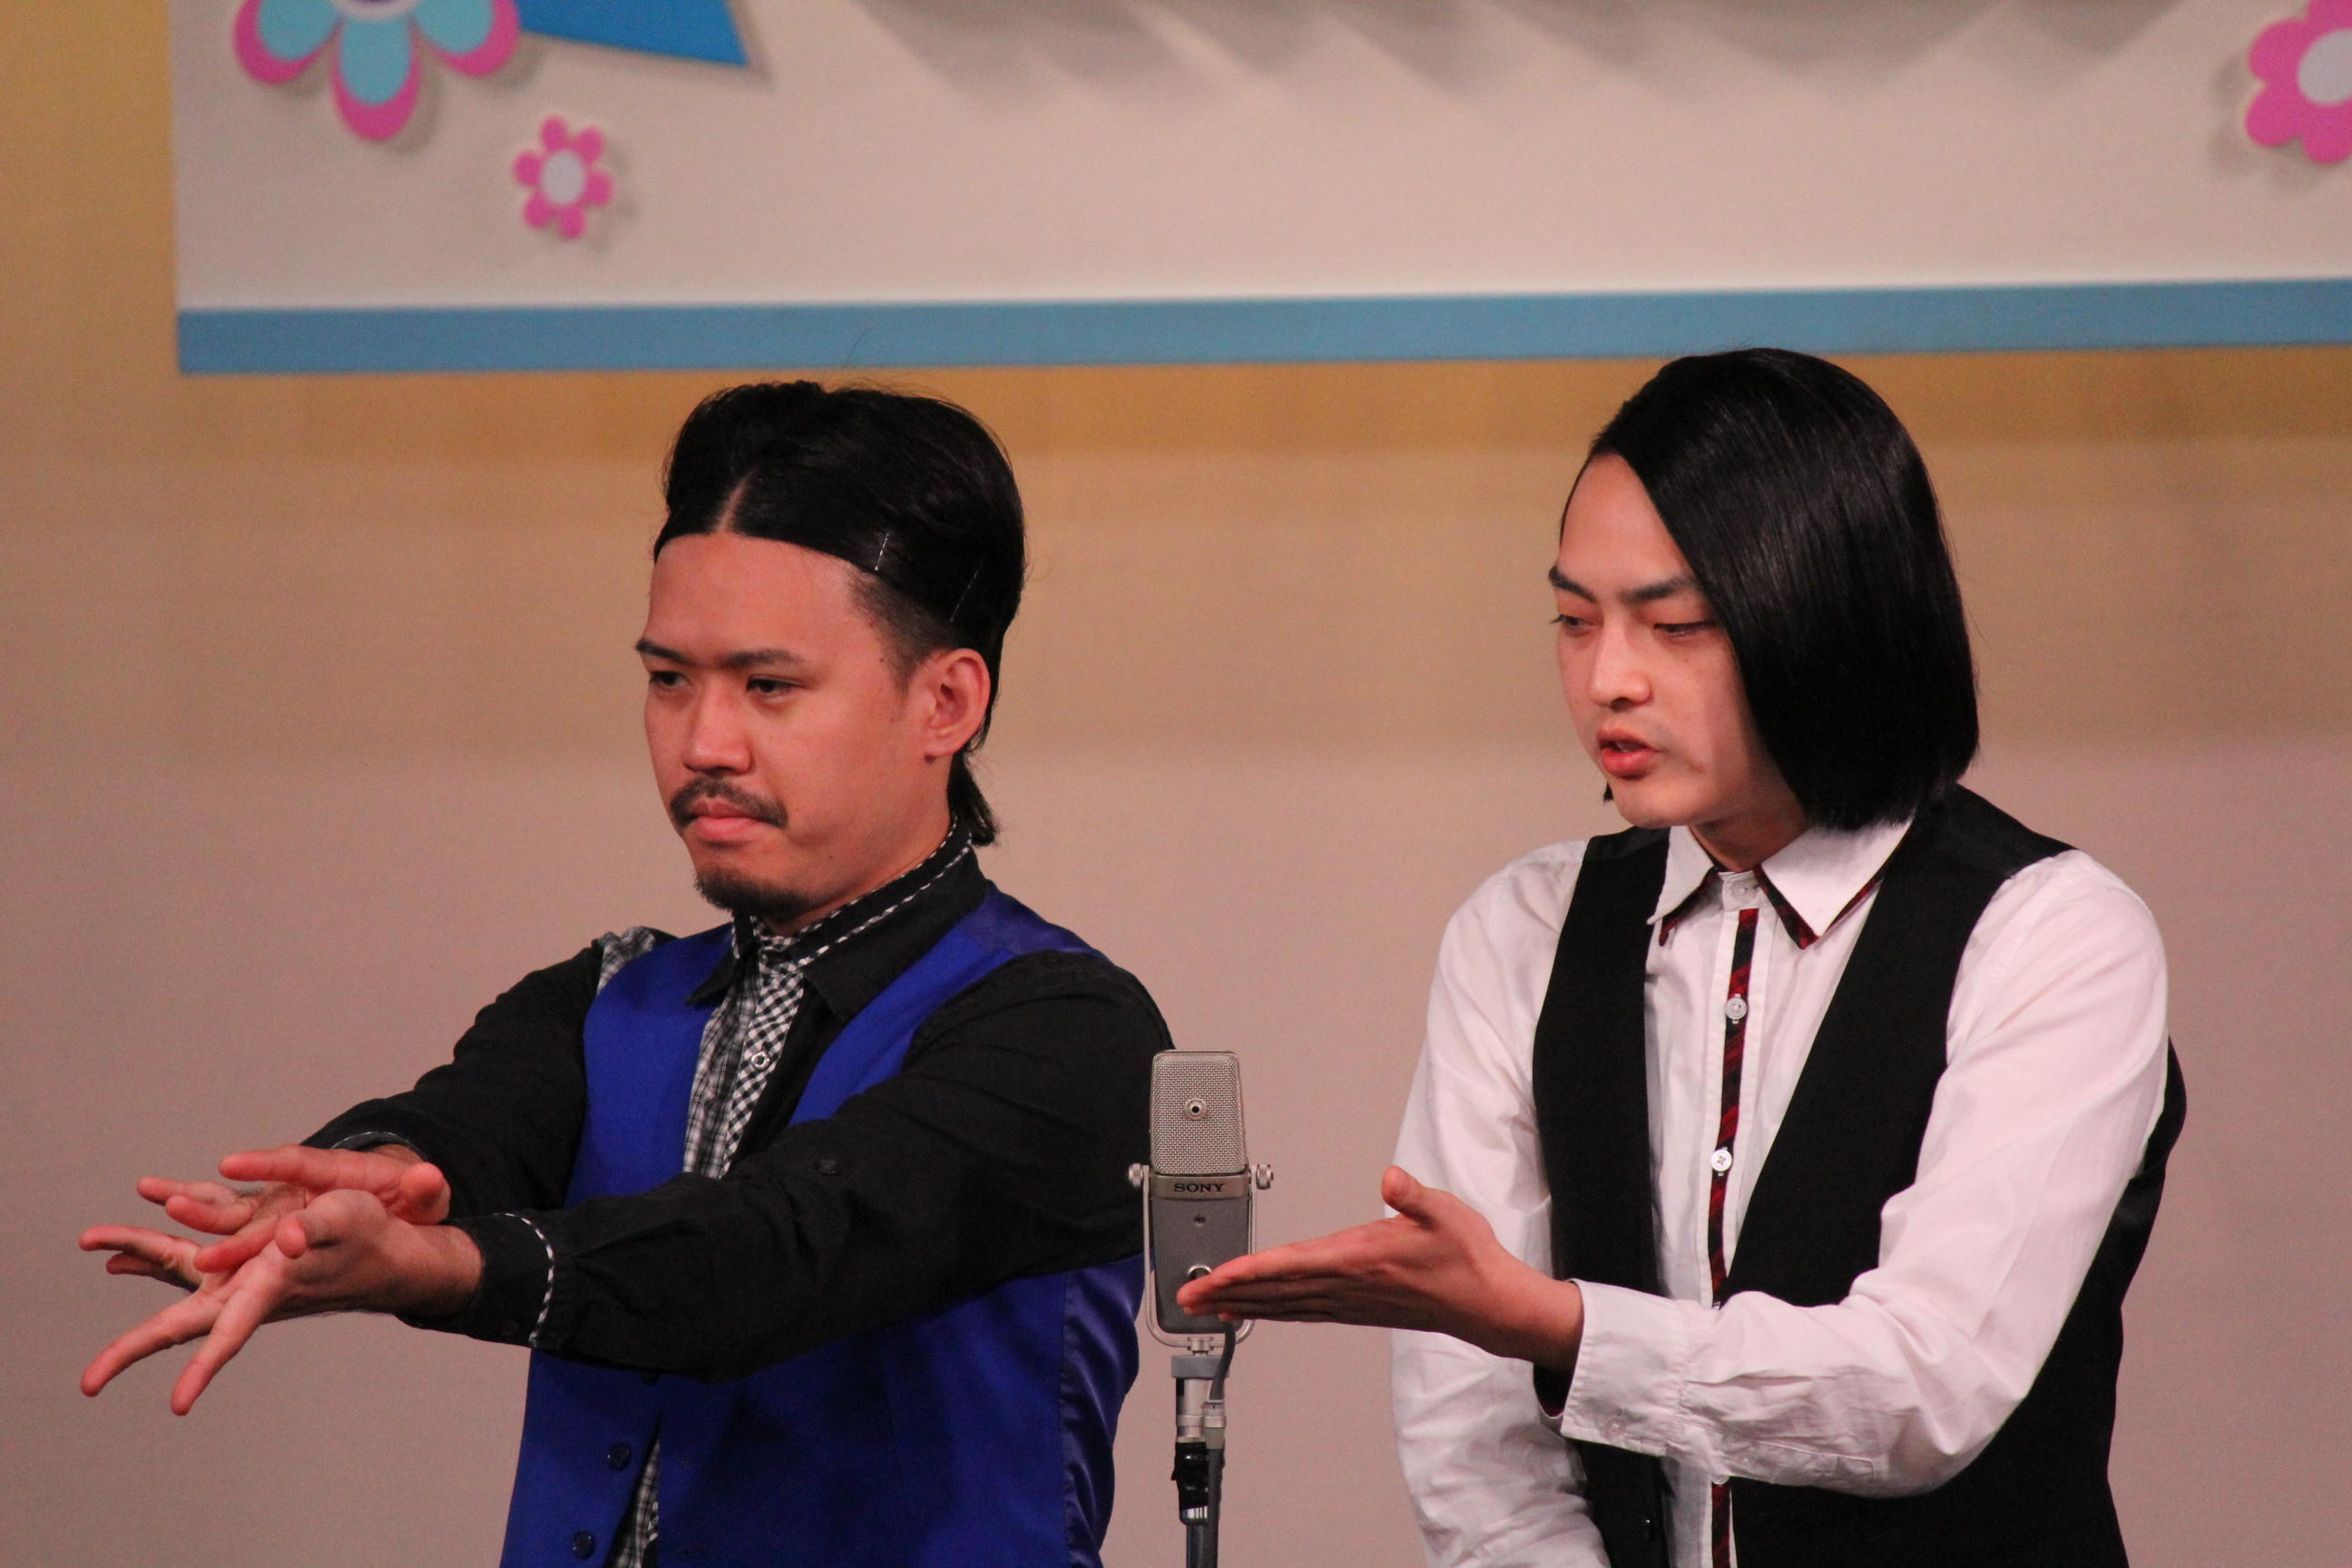 http://news.yoshimoto.co.jp/20151127174452-b94b8c660167f2447dfc0b3a3a1ea0cede7e7b92.jpg